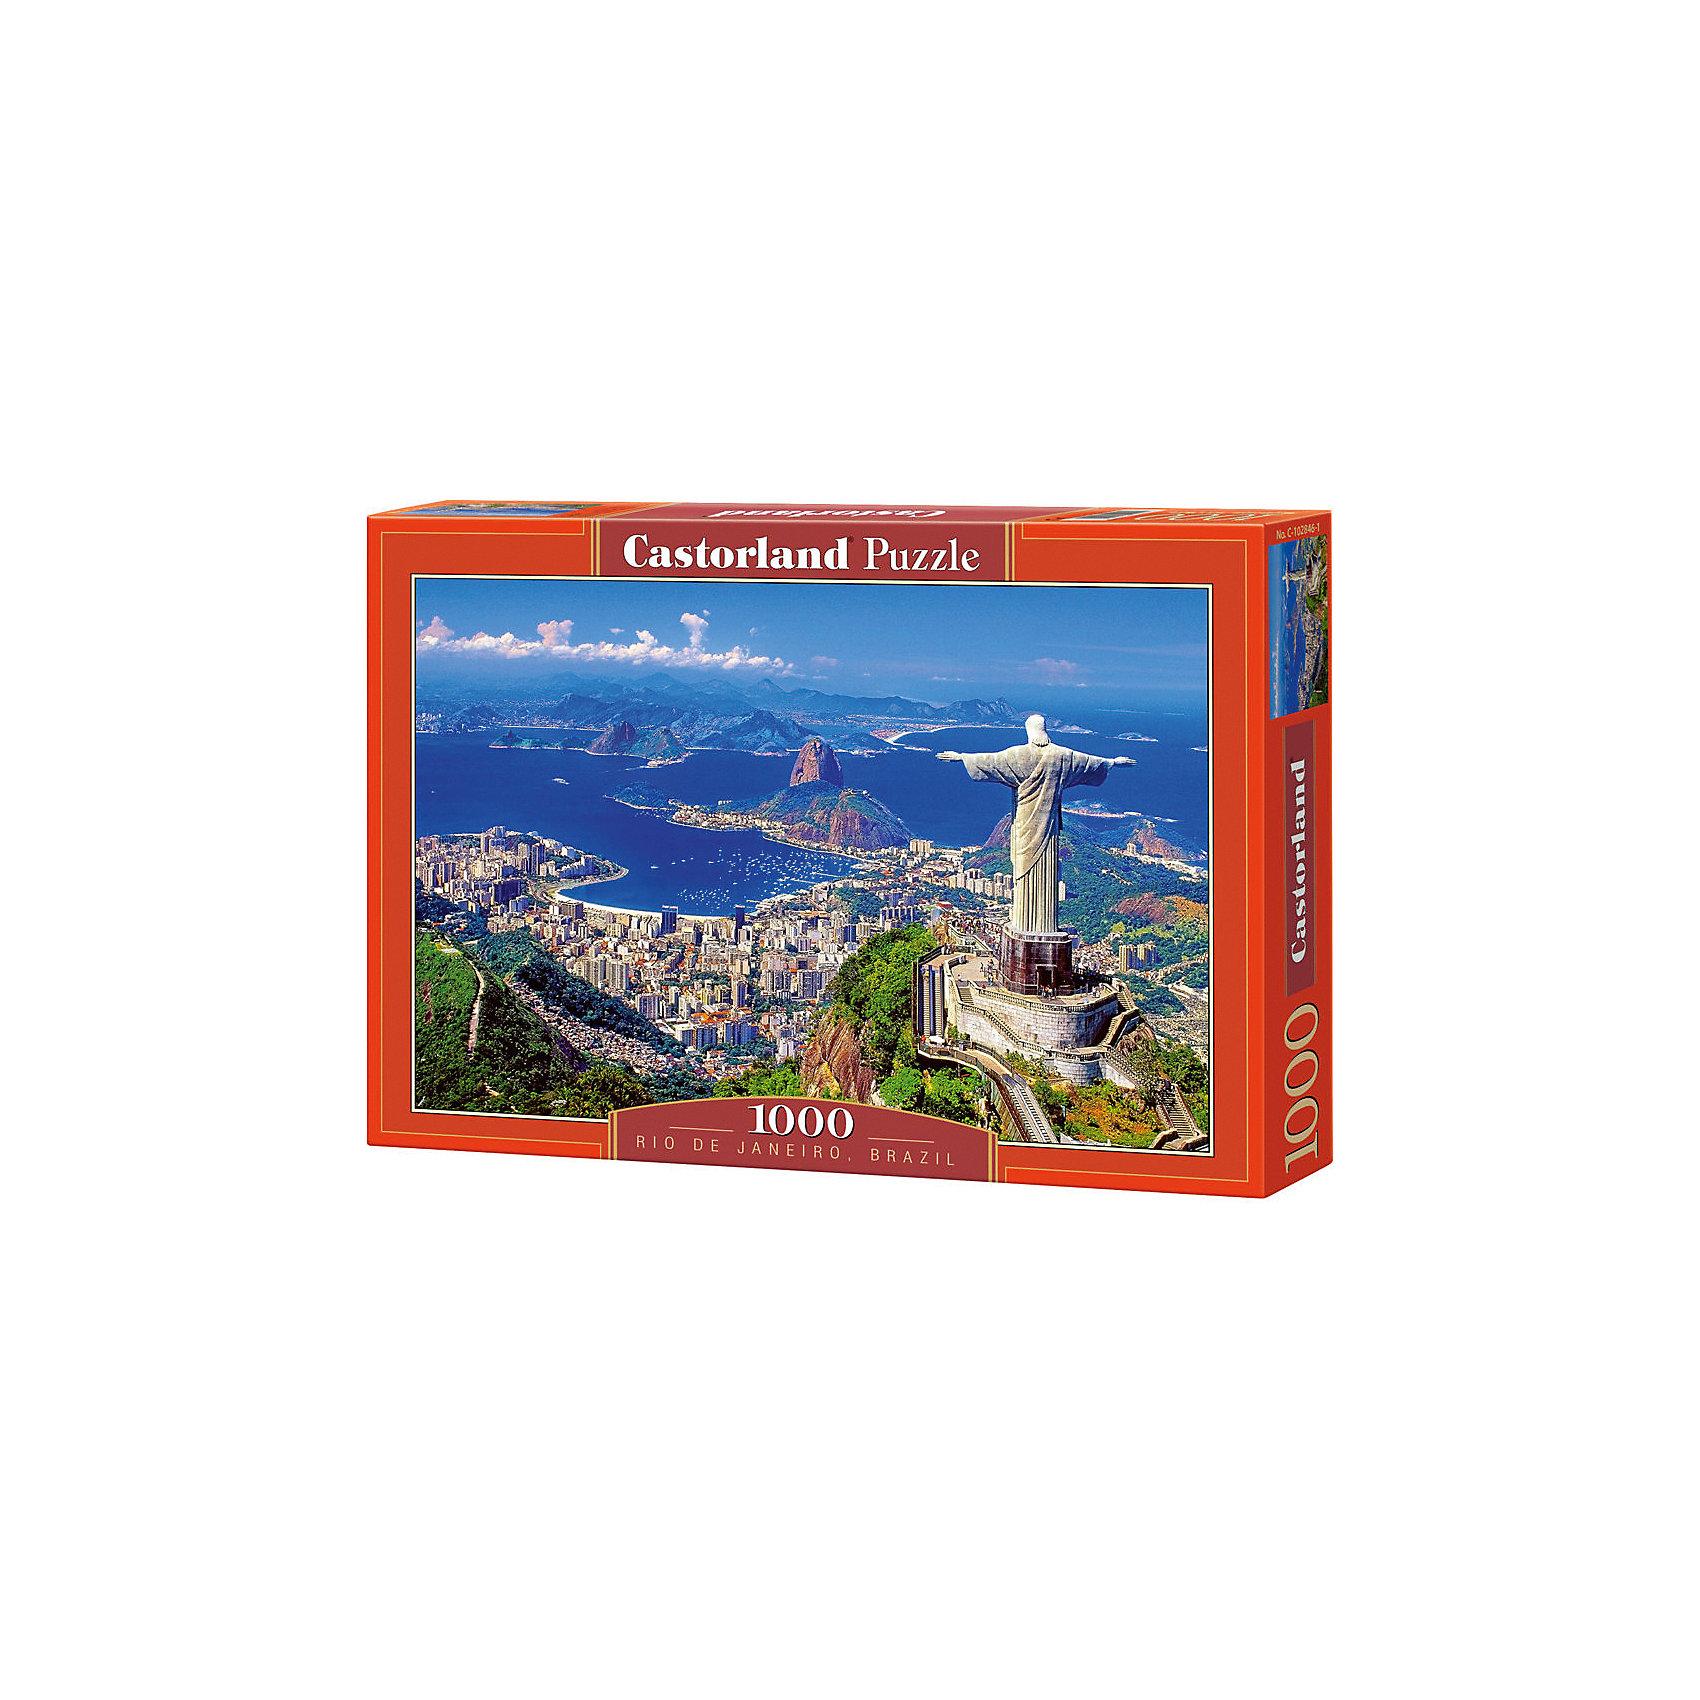 пазл-рио-де-жанейро-1000-деталей-castorland